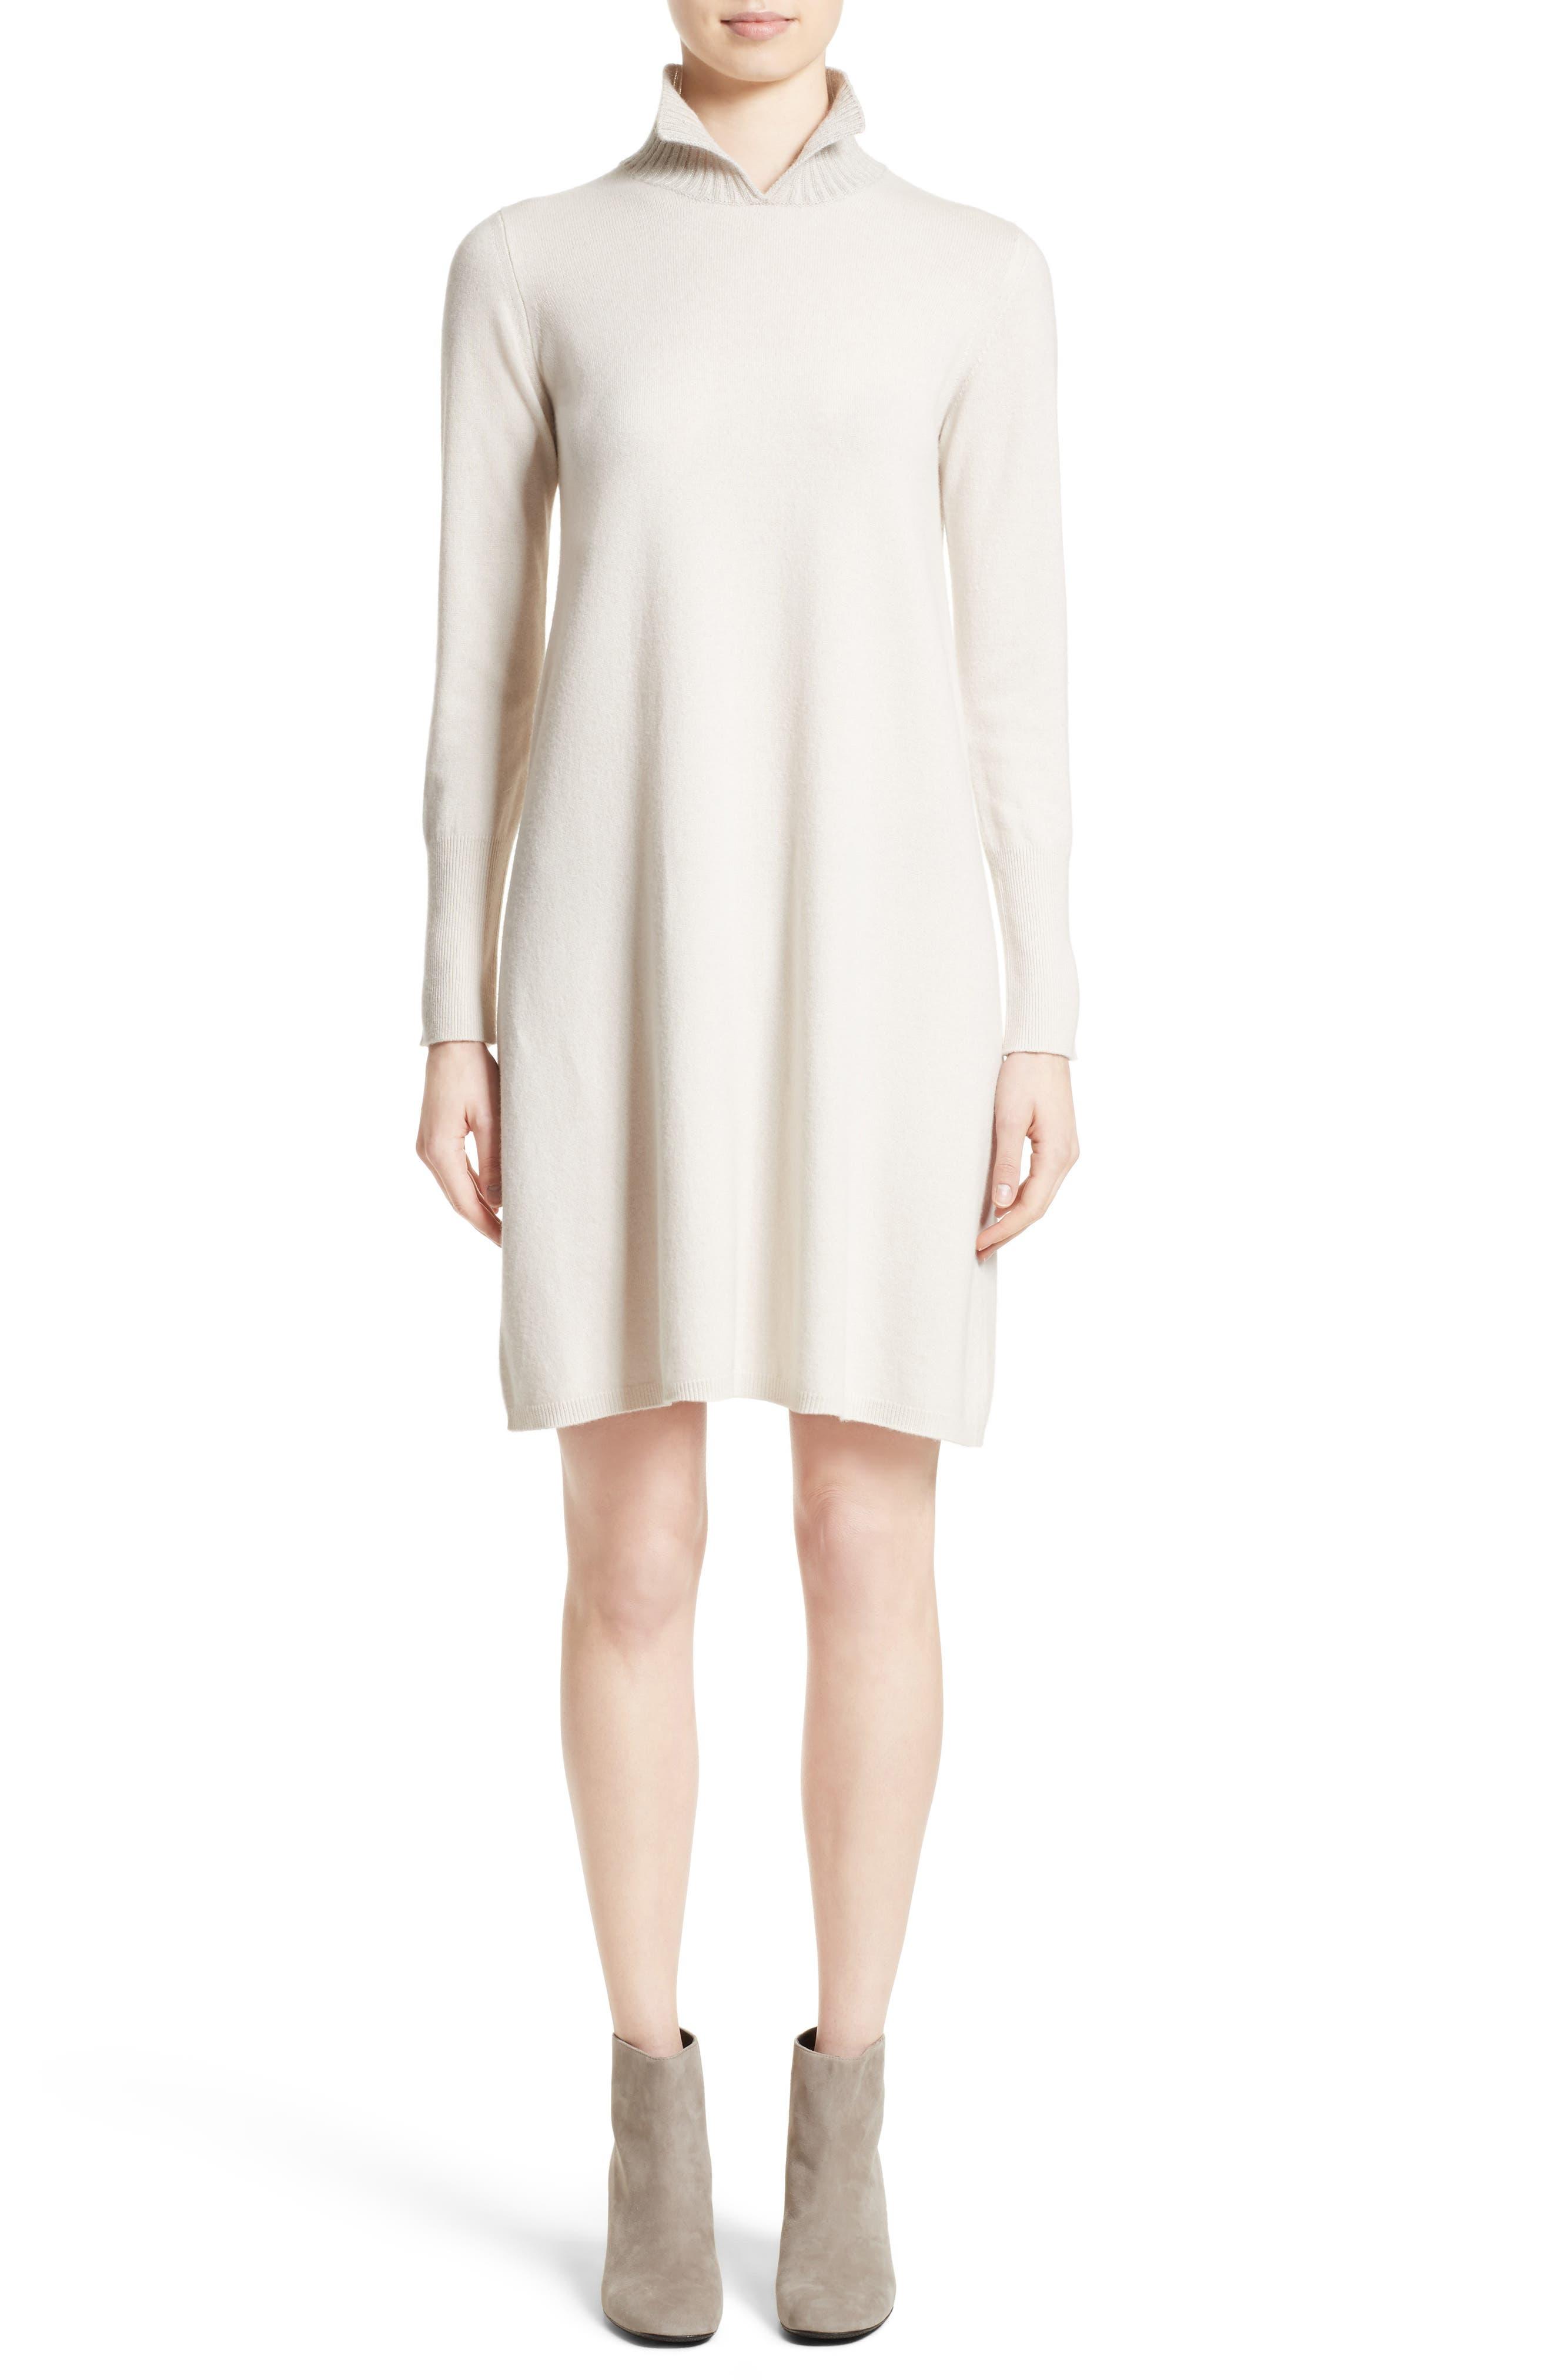 Wool, Silk & Cashmere Knit Dress,                         Main,                         color, Cream